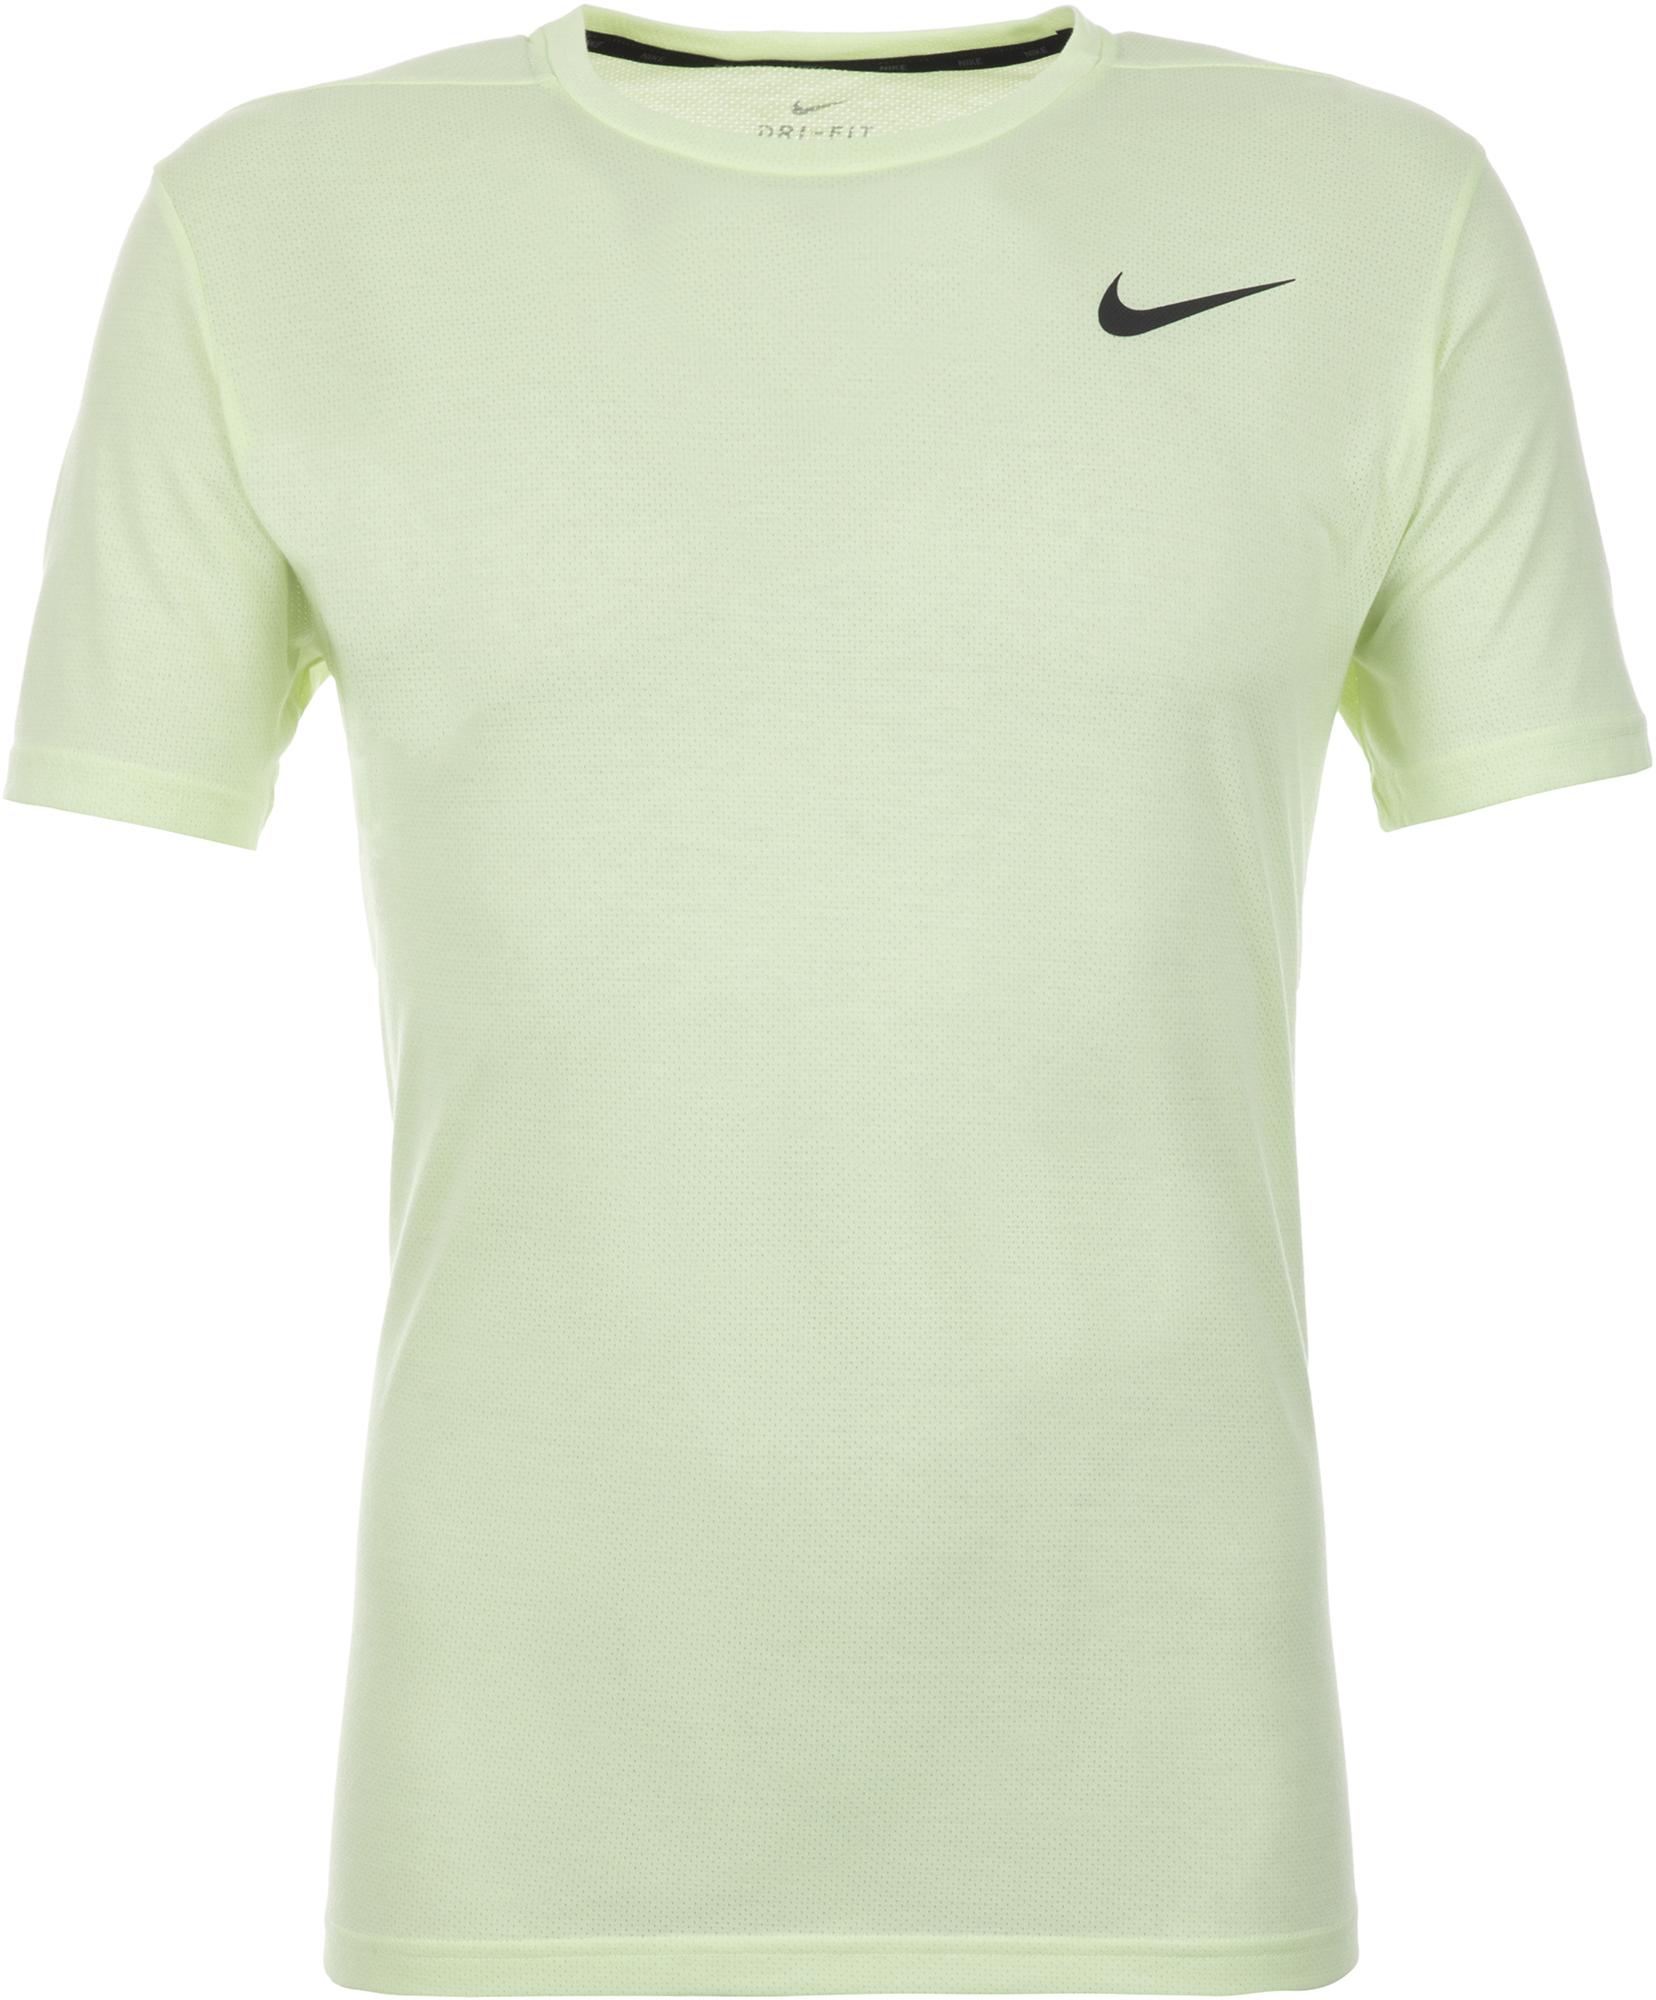 Nike Футболка мужская Breathe, размер 44-46